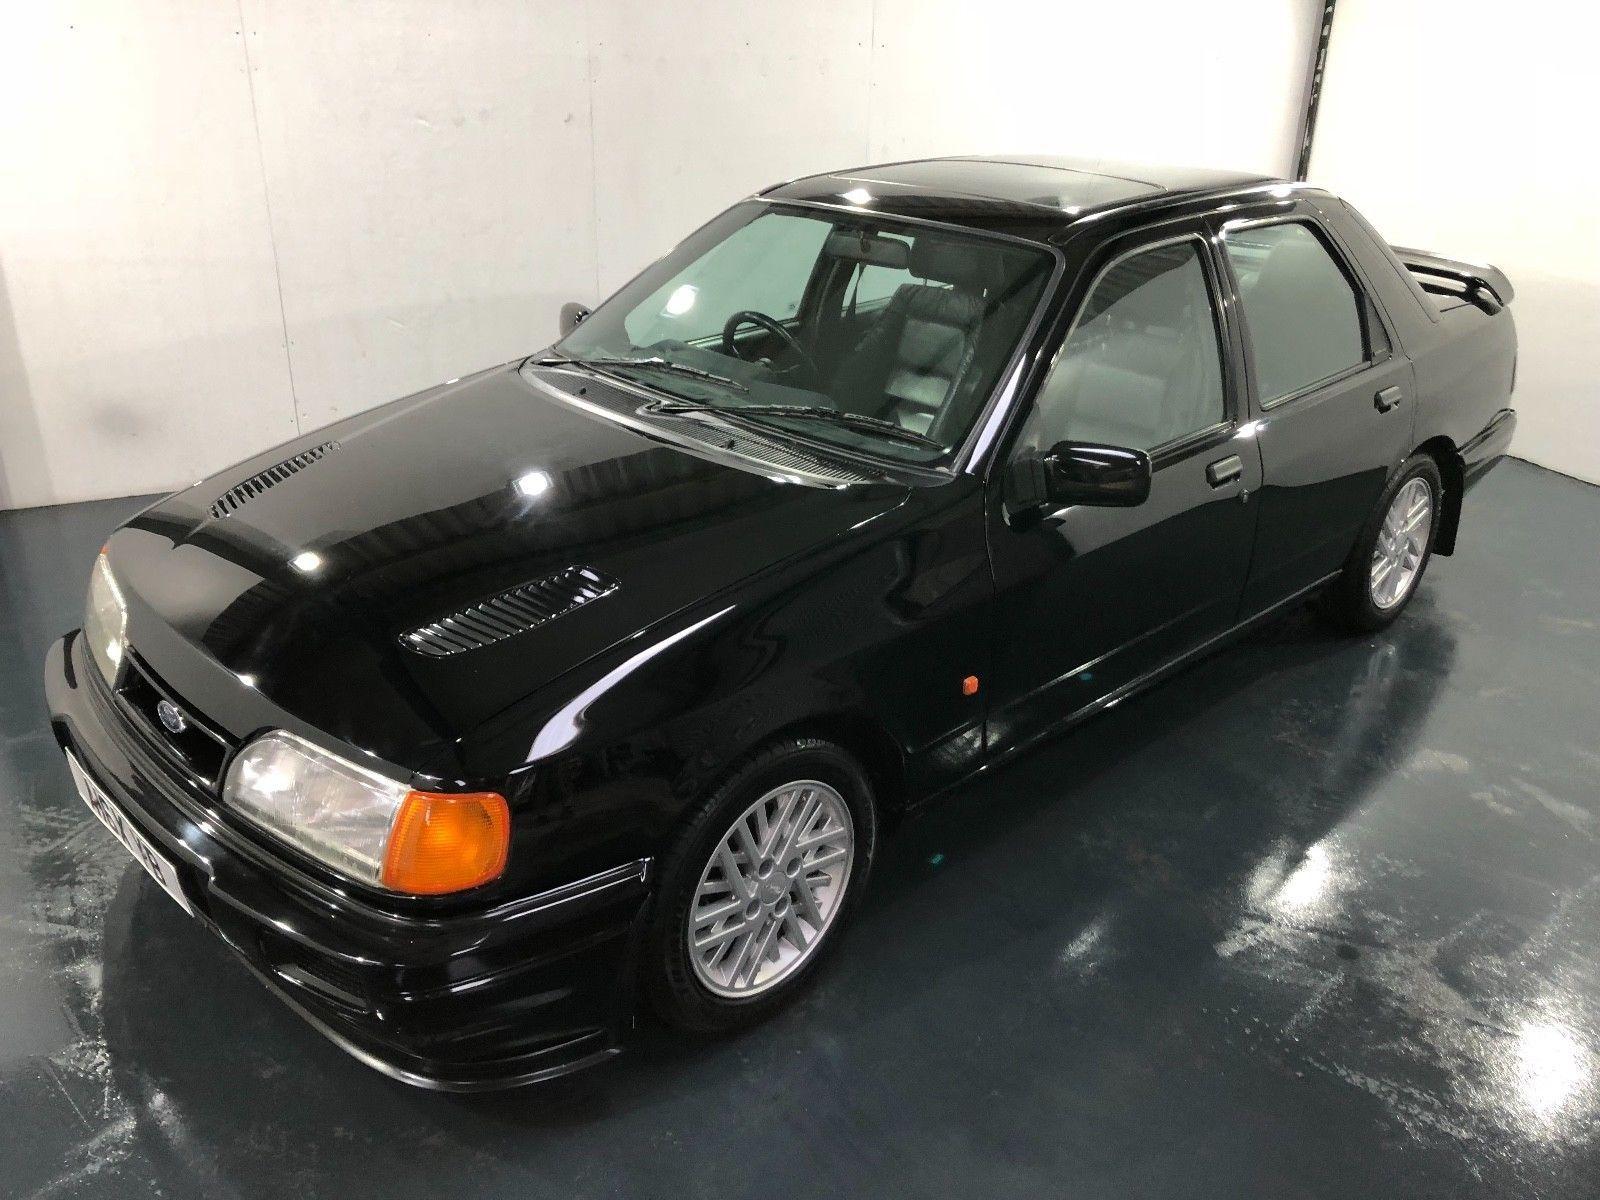 Ebay Classic Ford Sierra Cosworth 2wd Black Just Had Full Engine